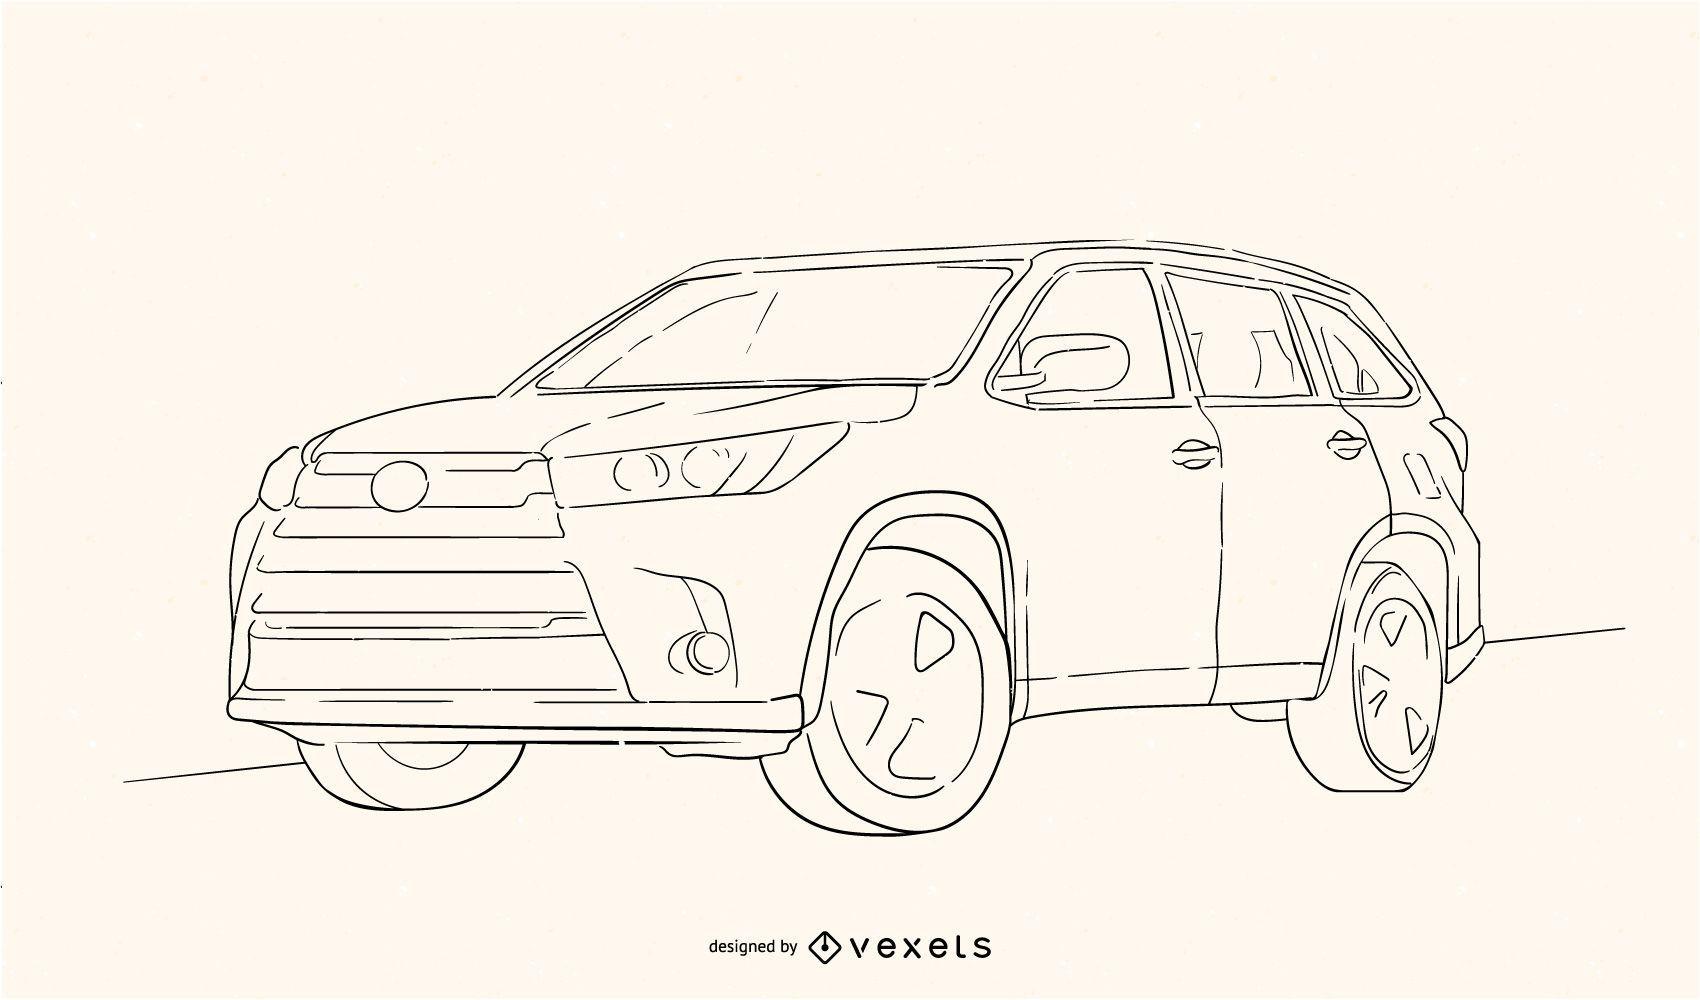 Toyota Highlander Sketch